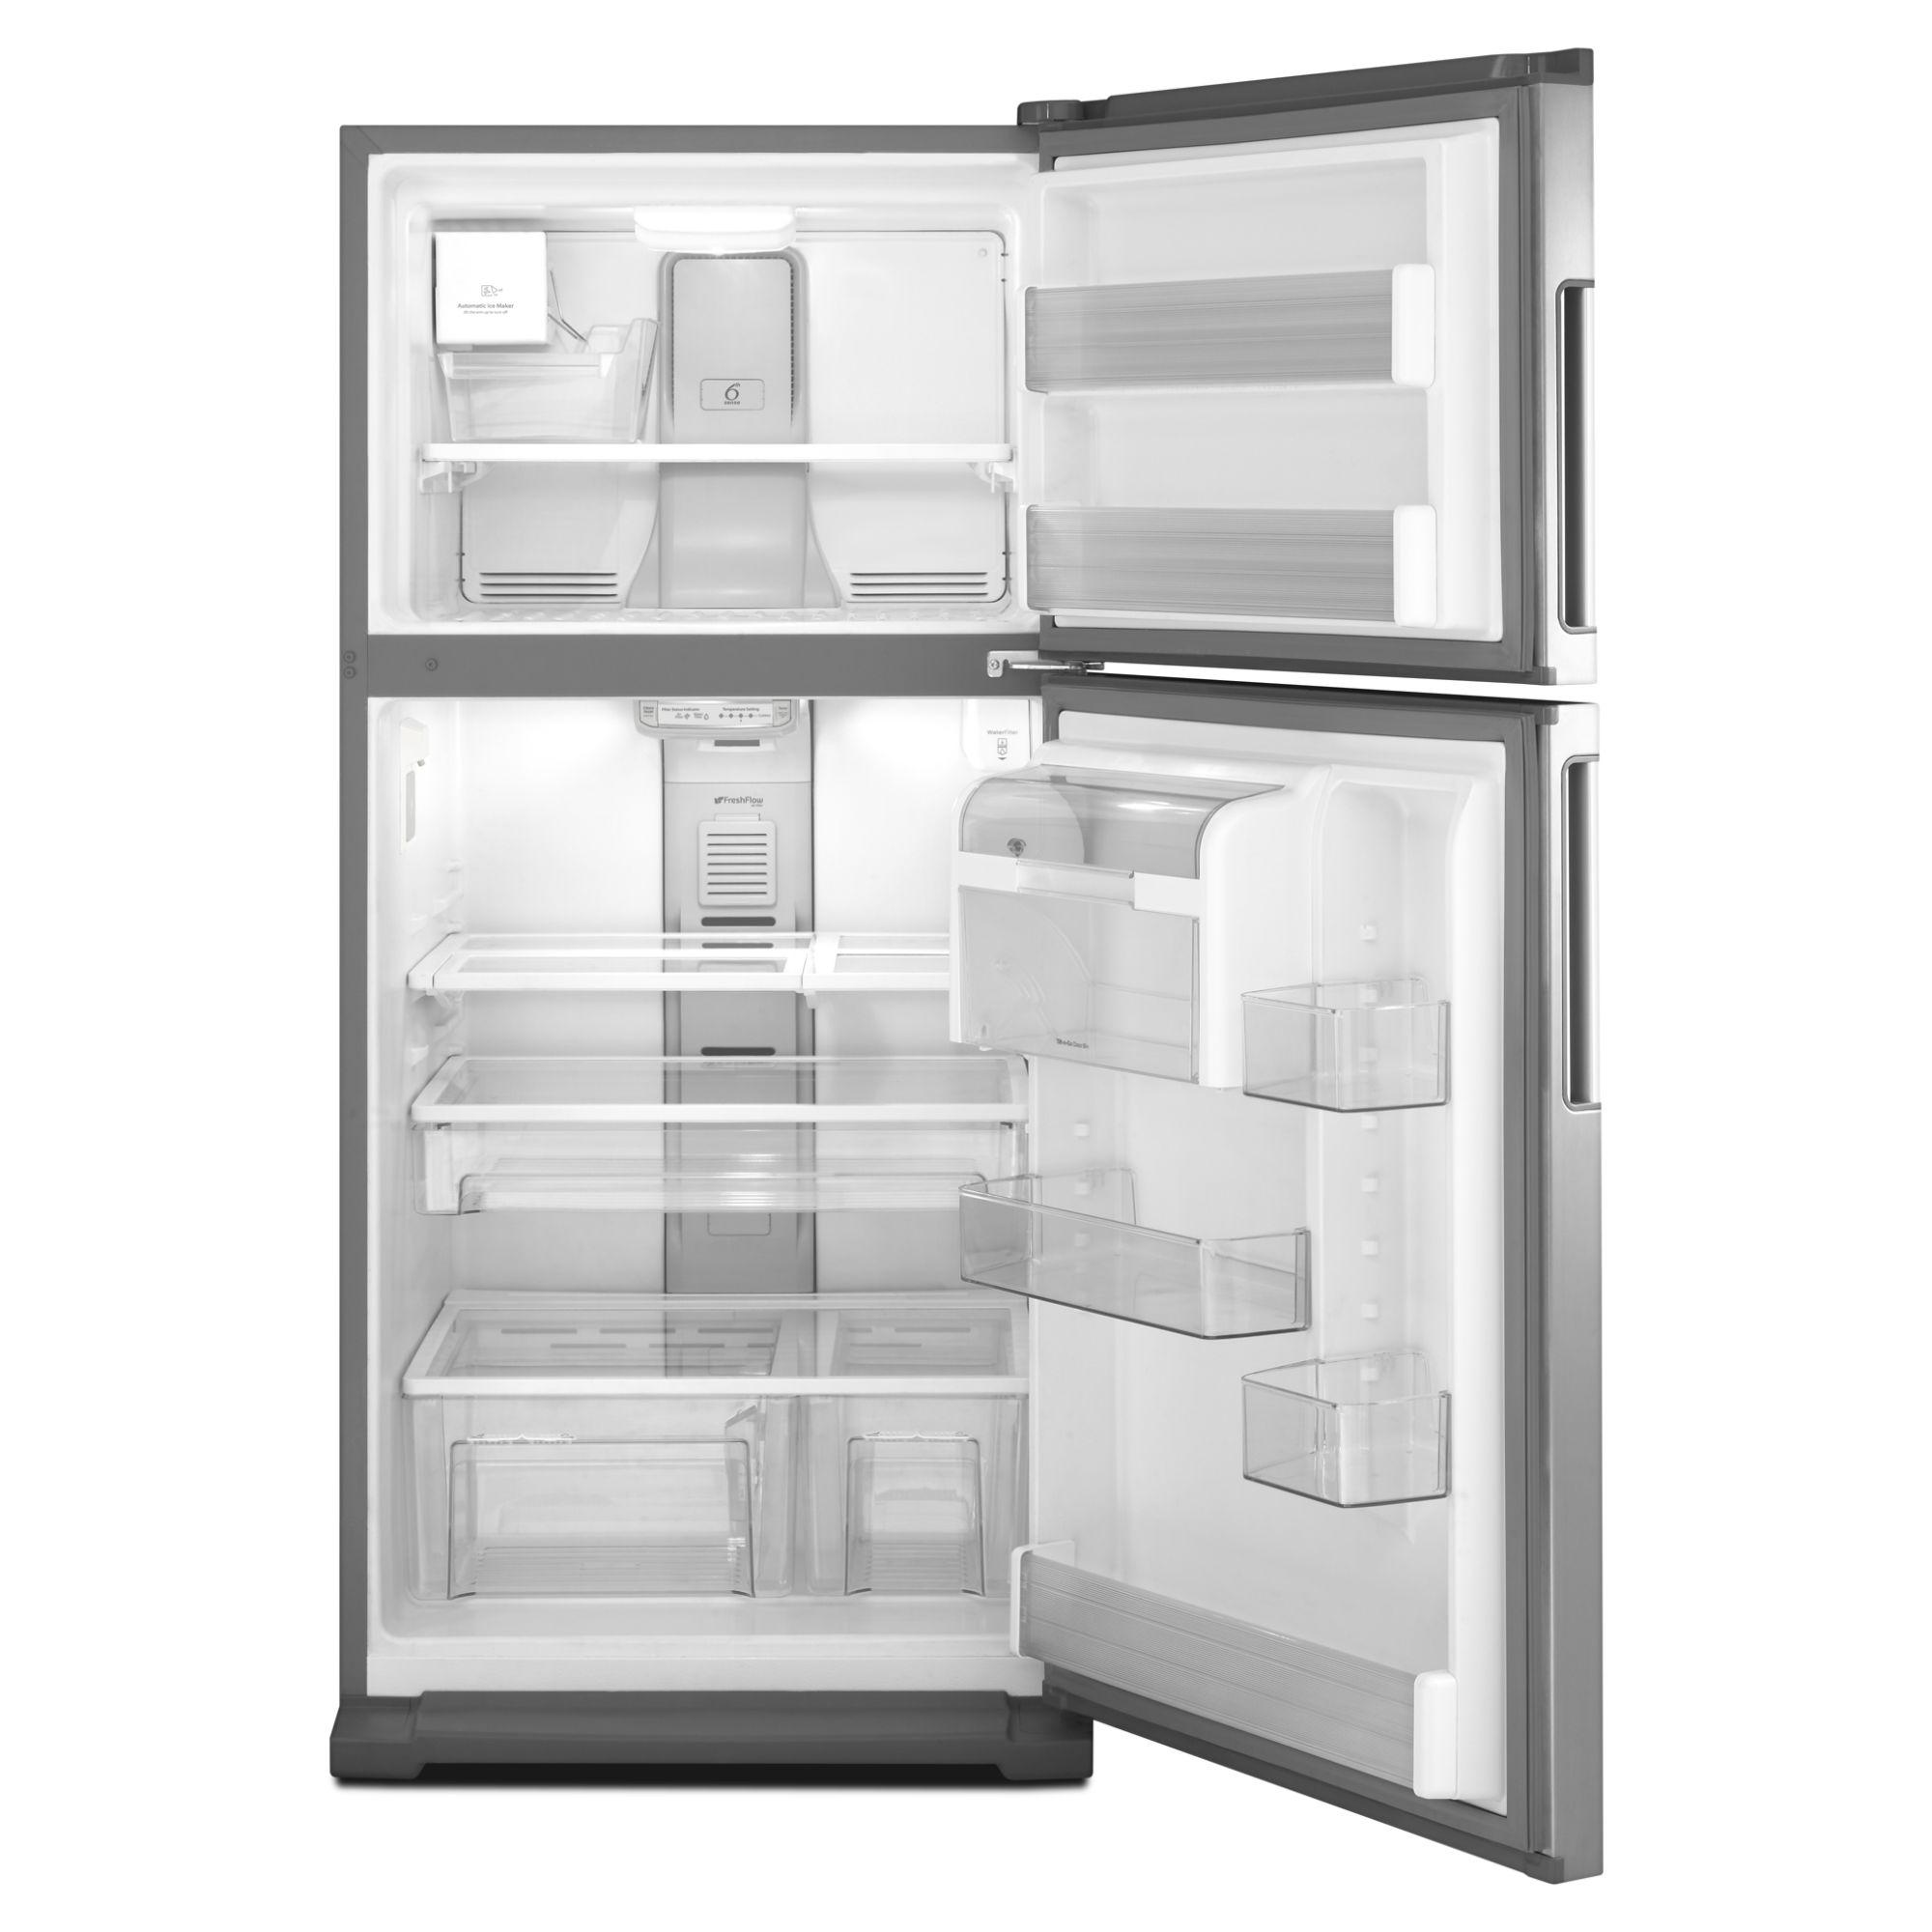 Whirlpool 19.0 cu. ft. Top-Freezer Refrigerator w/ Interior Water Dispenser - Stainless Steel